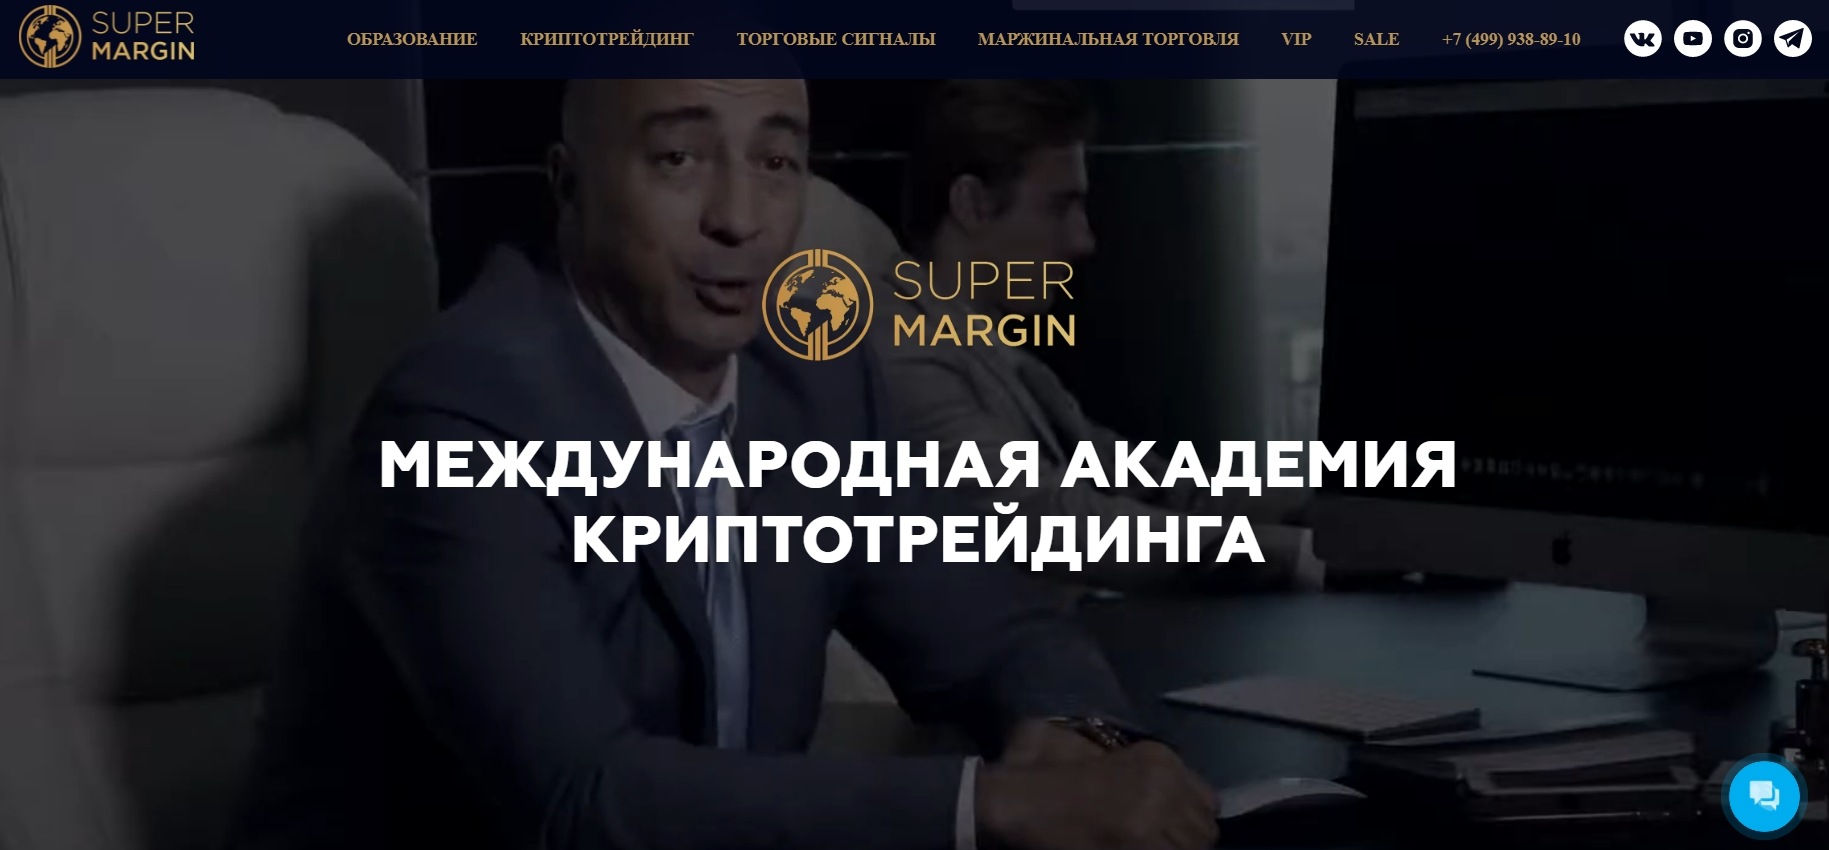 Международная академия криптотрейдинга Армена Геворкяна